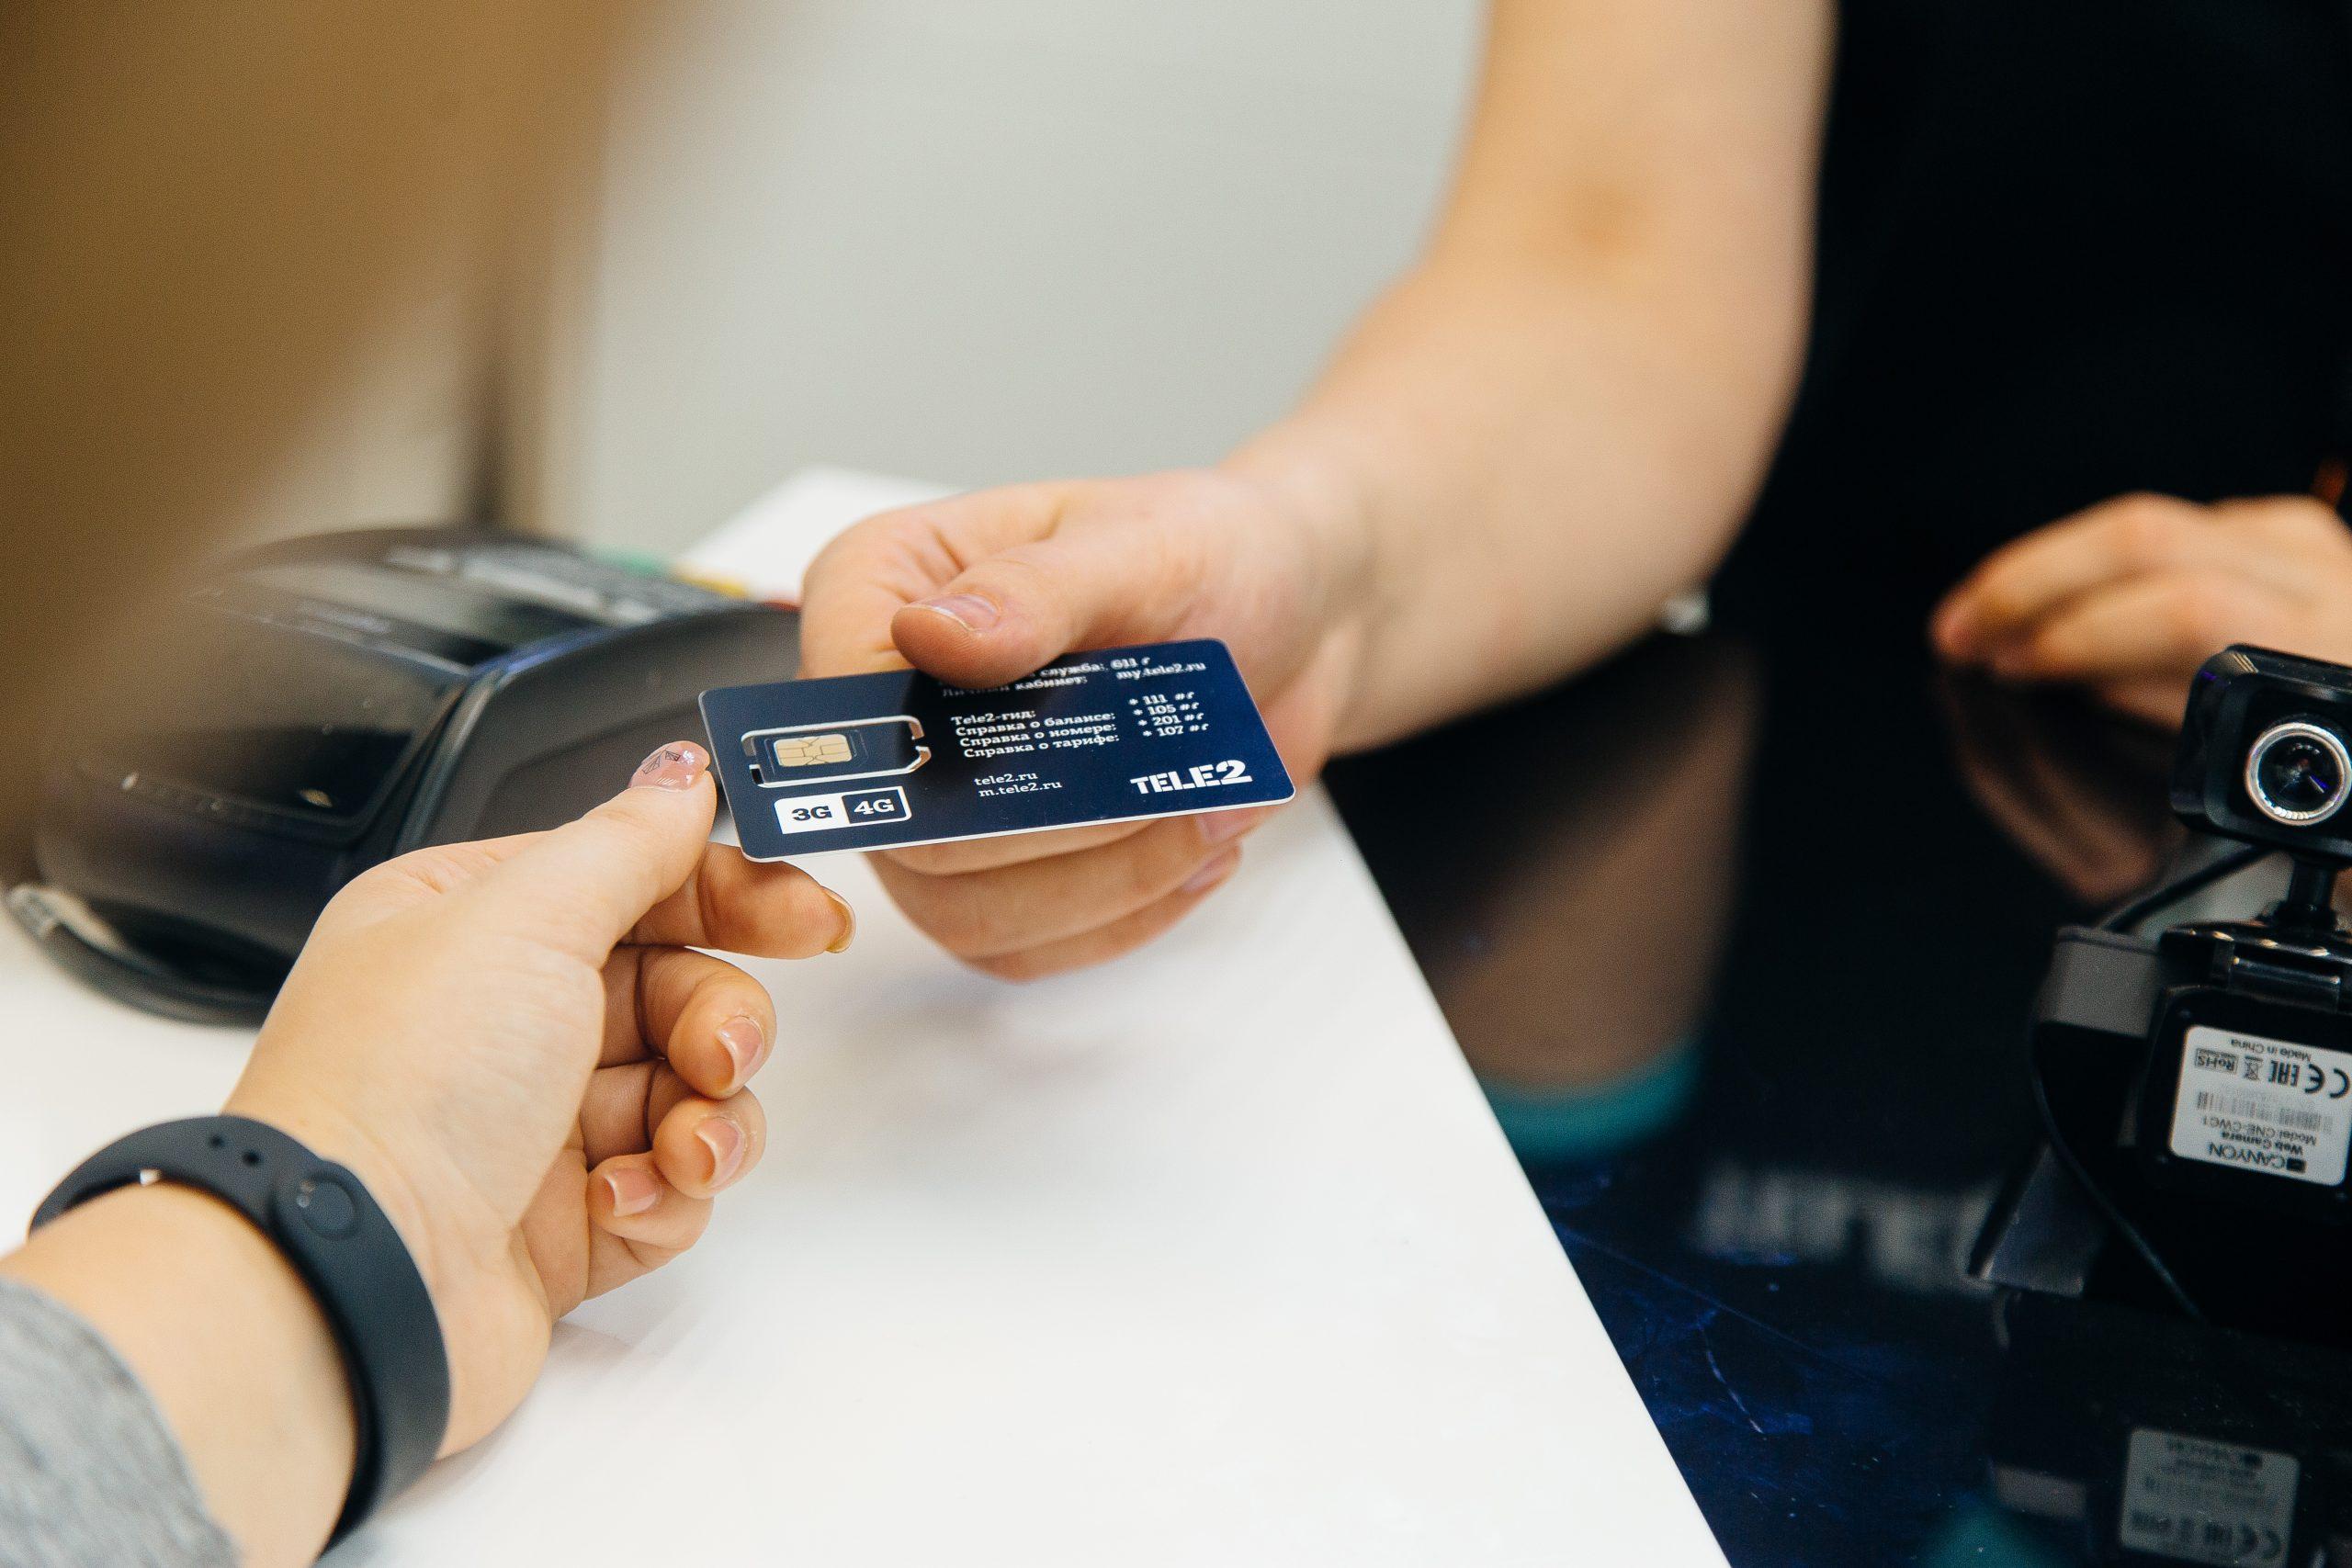 Tele2 запускает доставку SIM-карт с «Яндекс.Такси» в Мурманске и Североморске 1